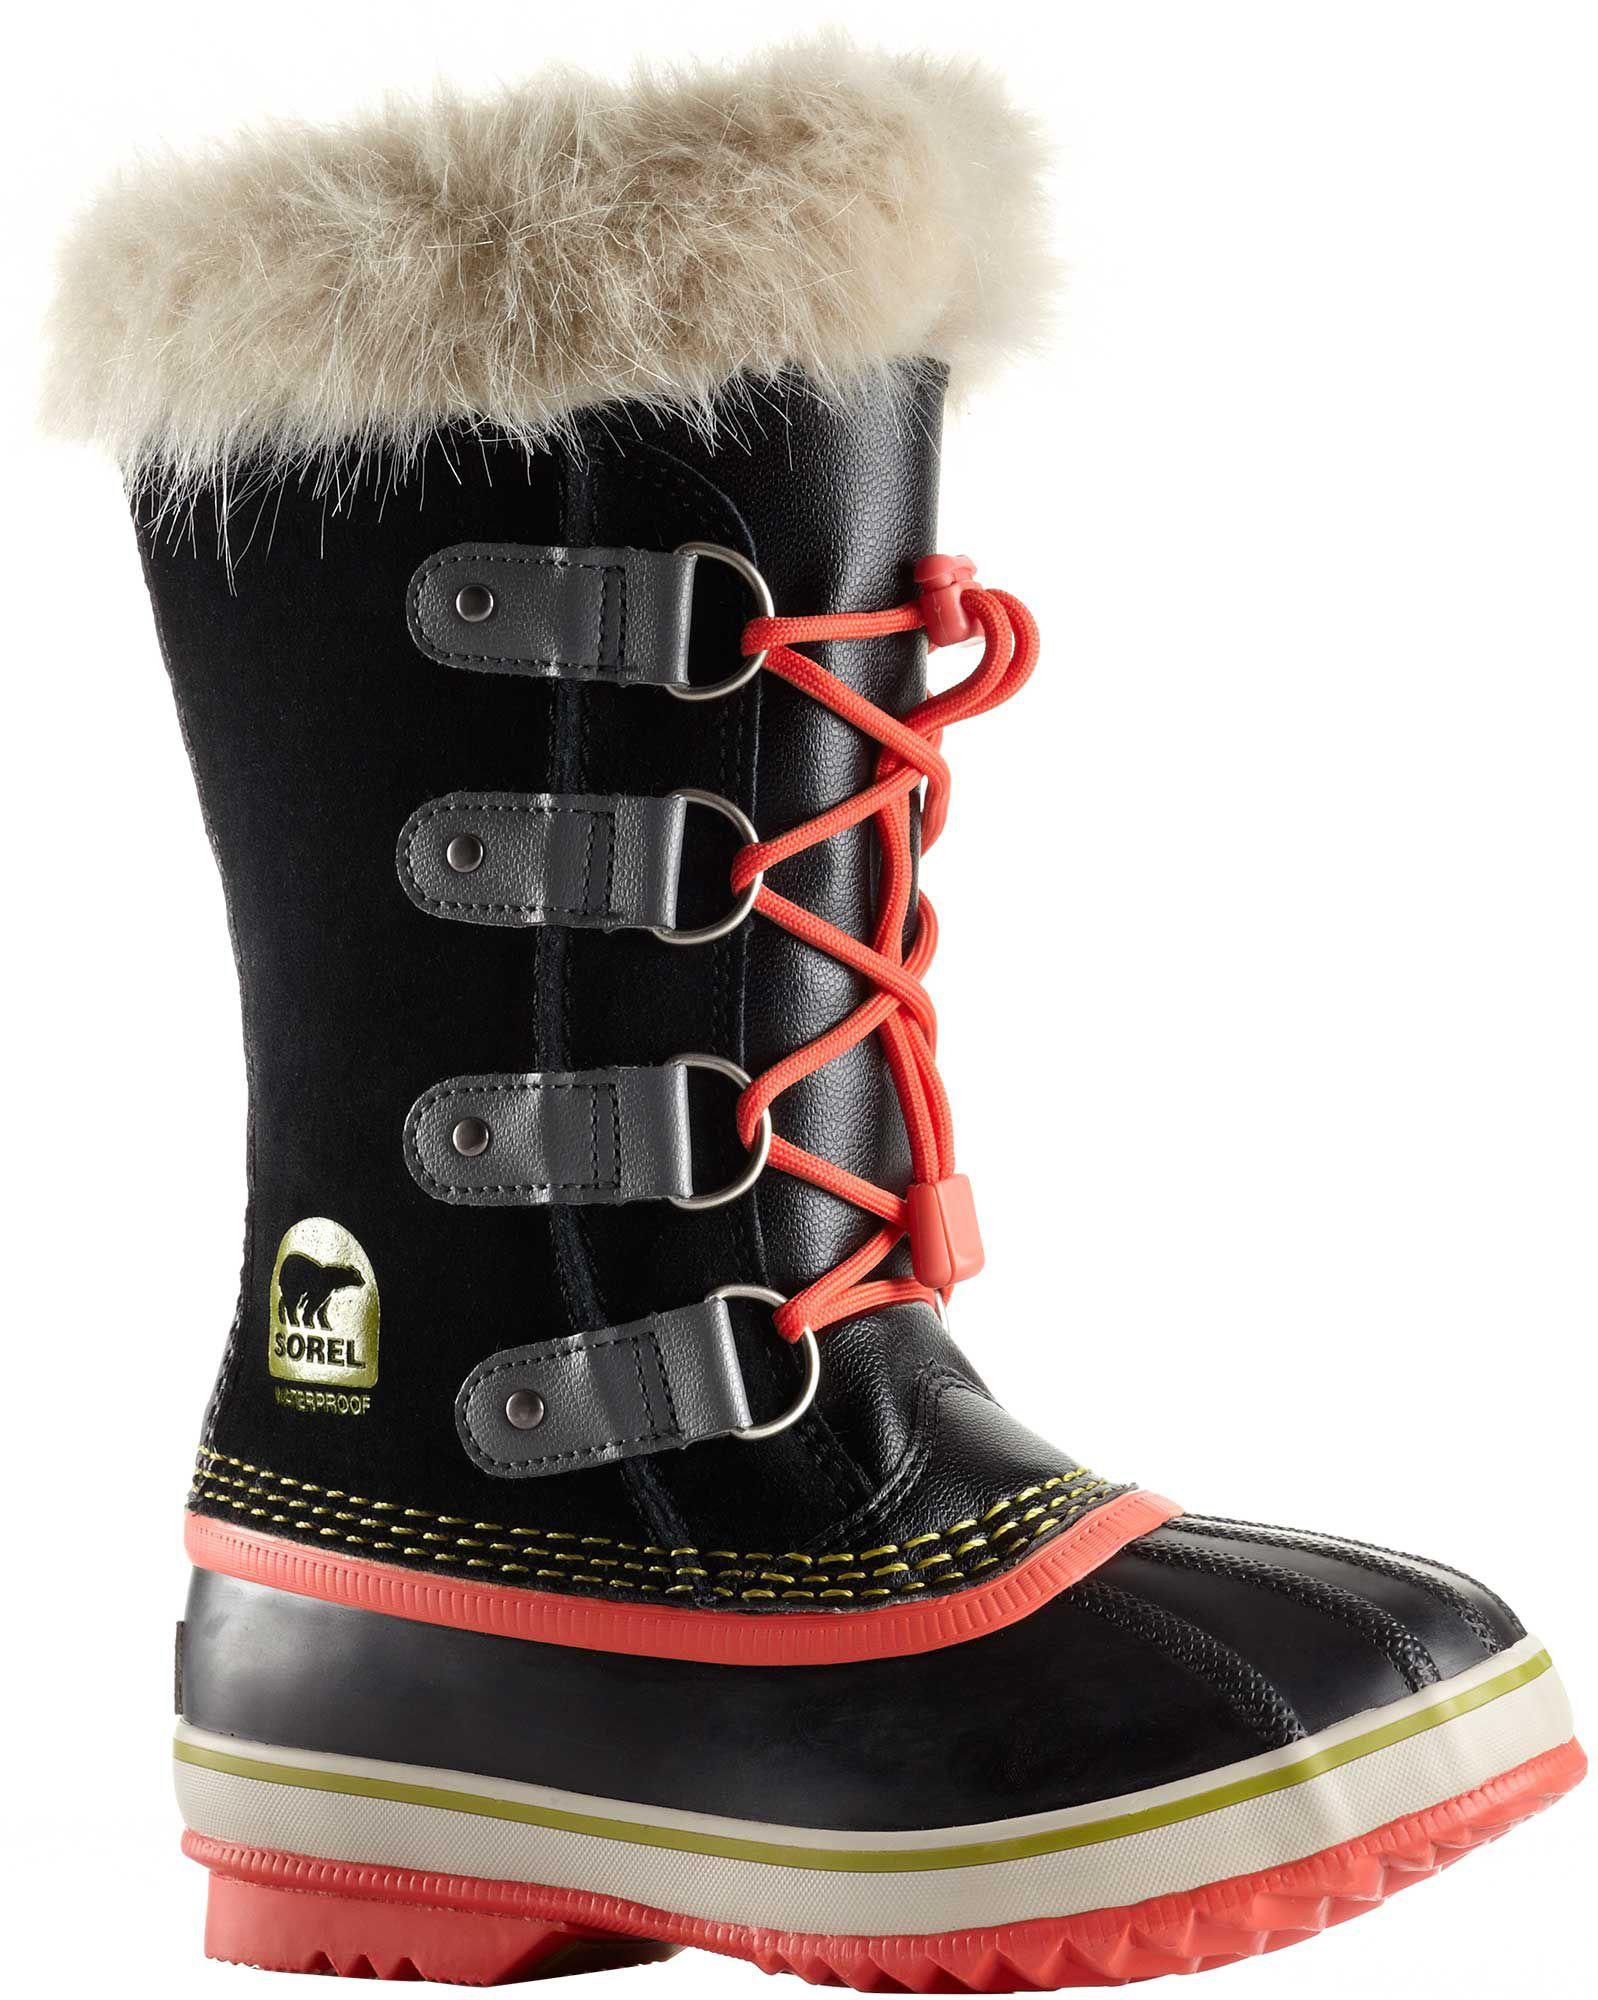 878dfab6cd6fc Sorel Kids  Joan of Arctic Insulated Waterproof Winter Boots